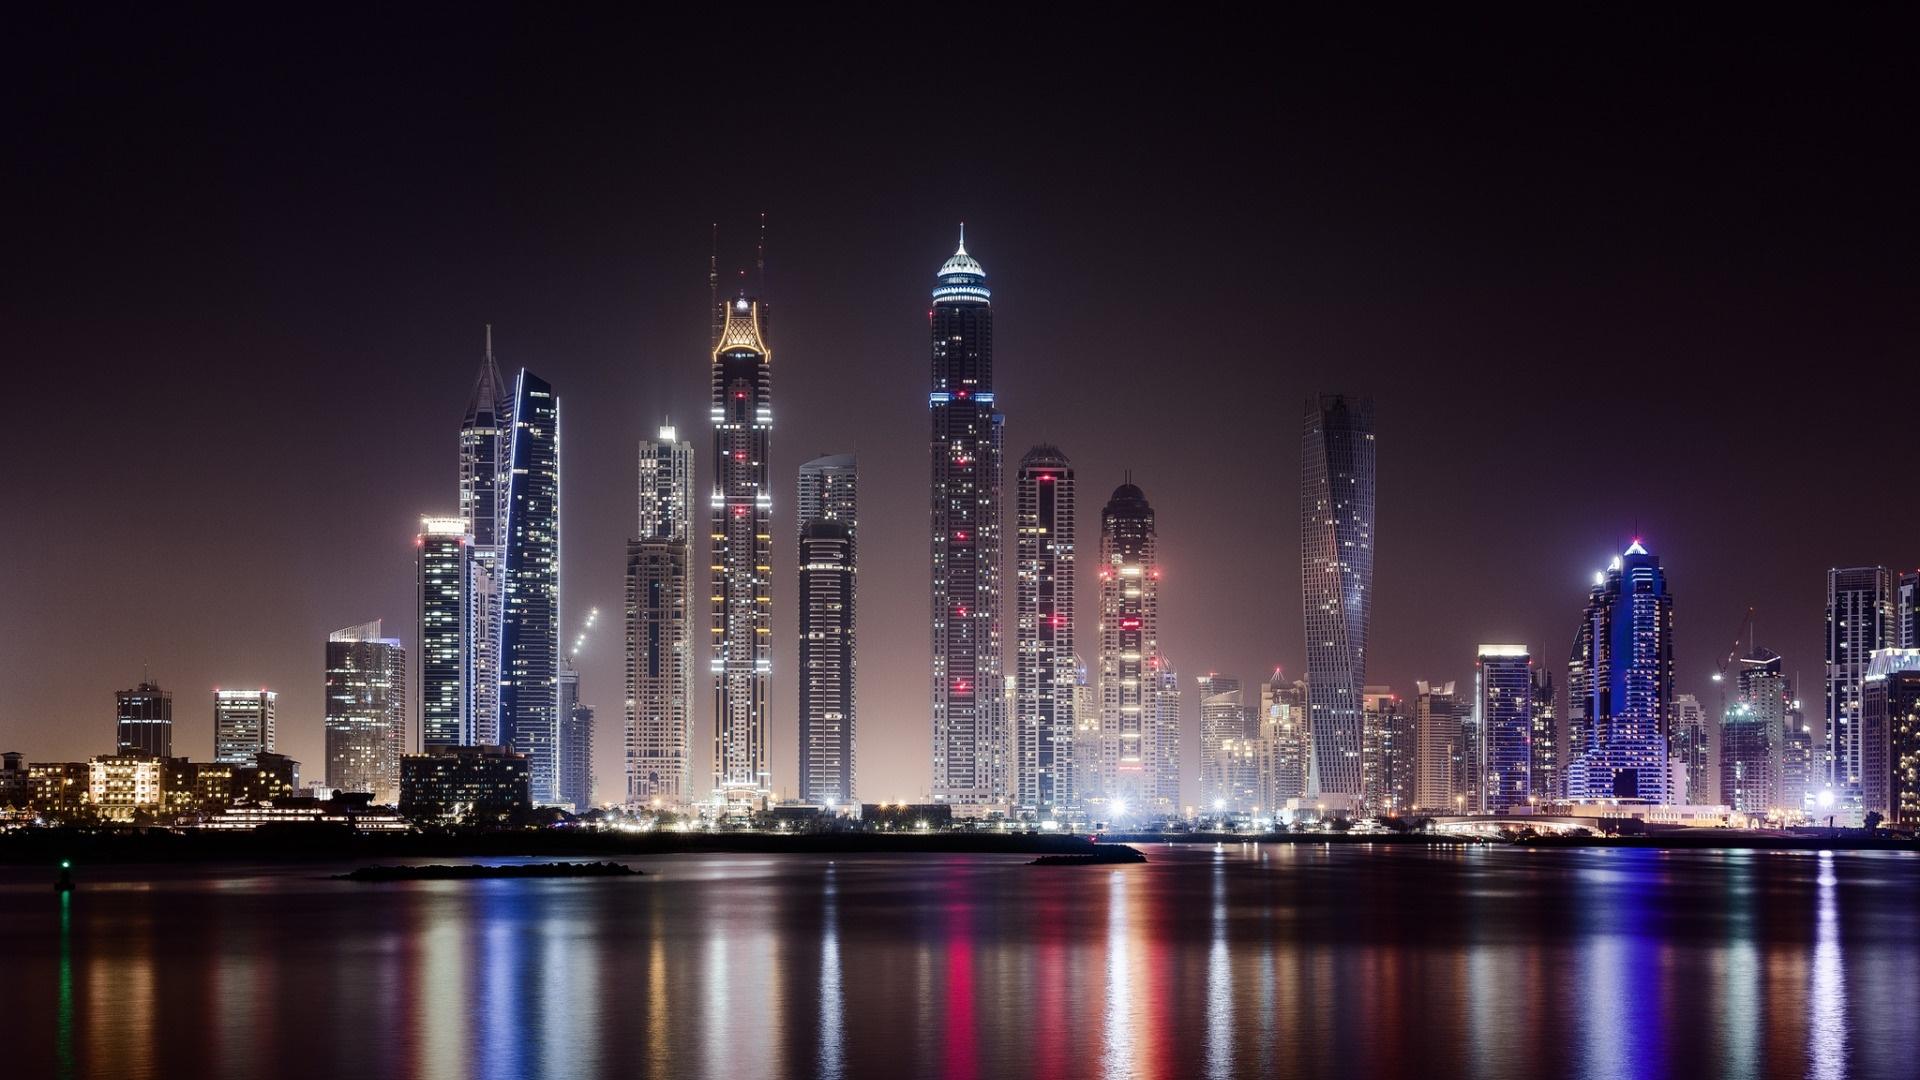 Dubai wallpaper photo